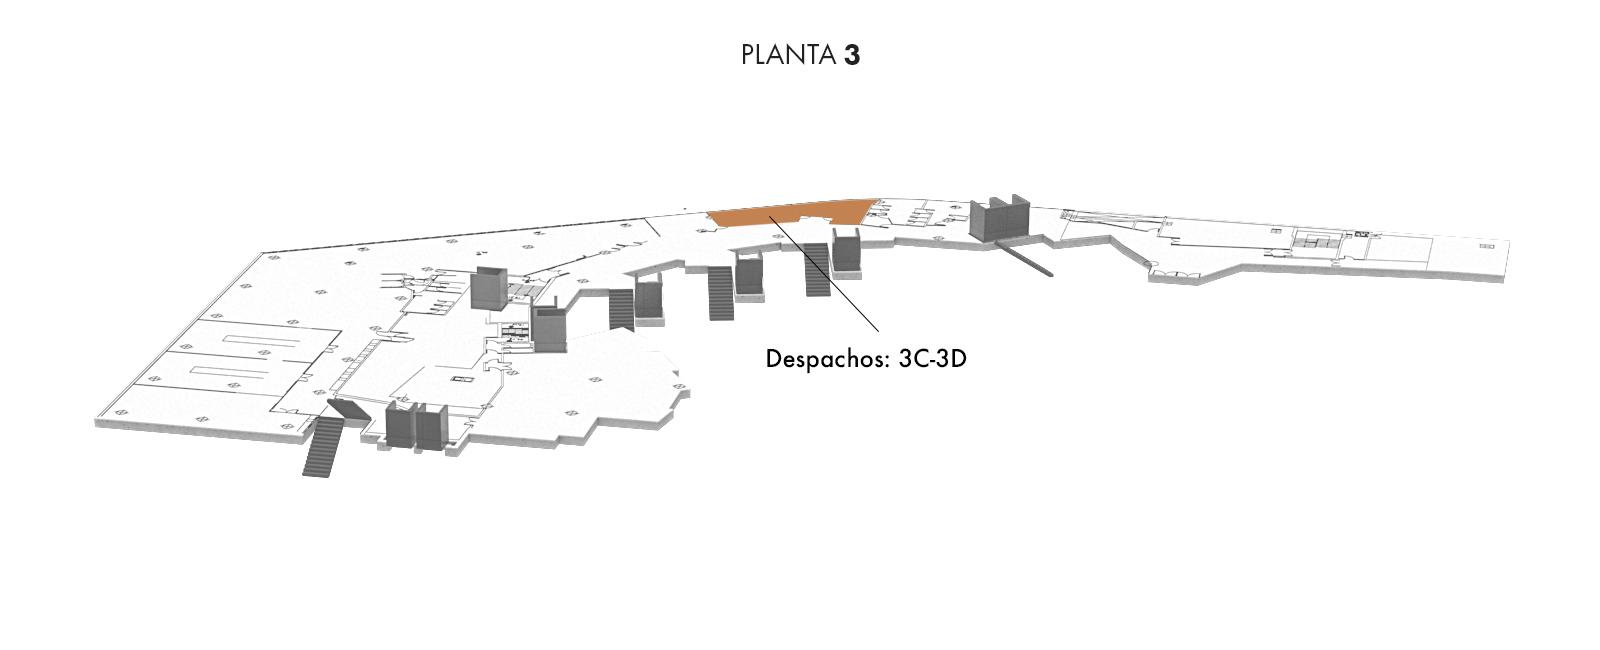 Despachos: 3C-3D, Planta 3 | Palacio Euskalduna Jauregia